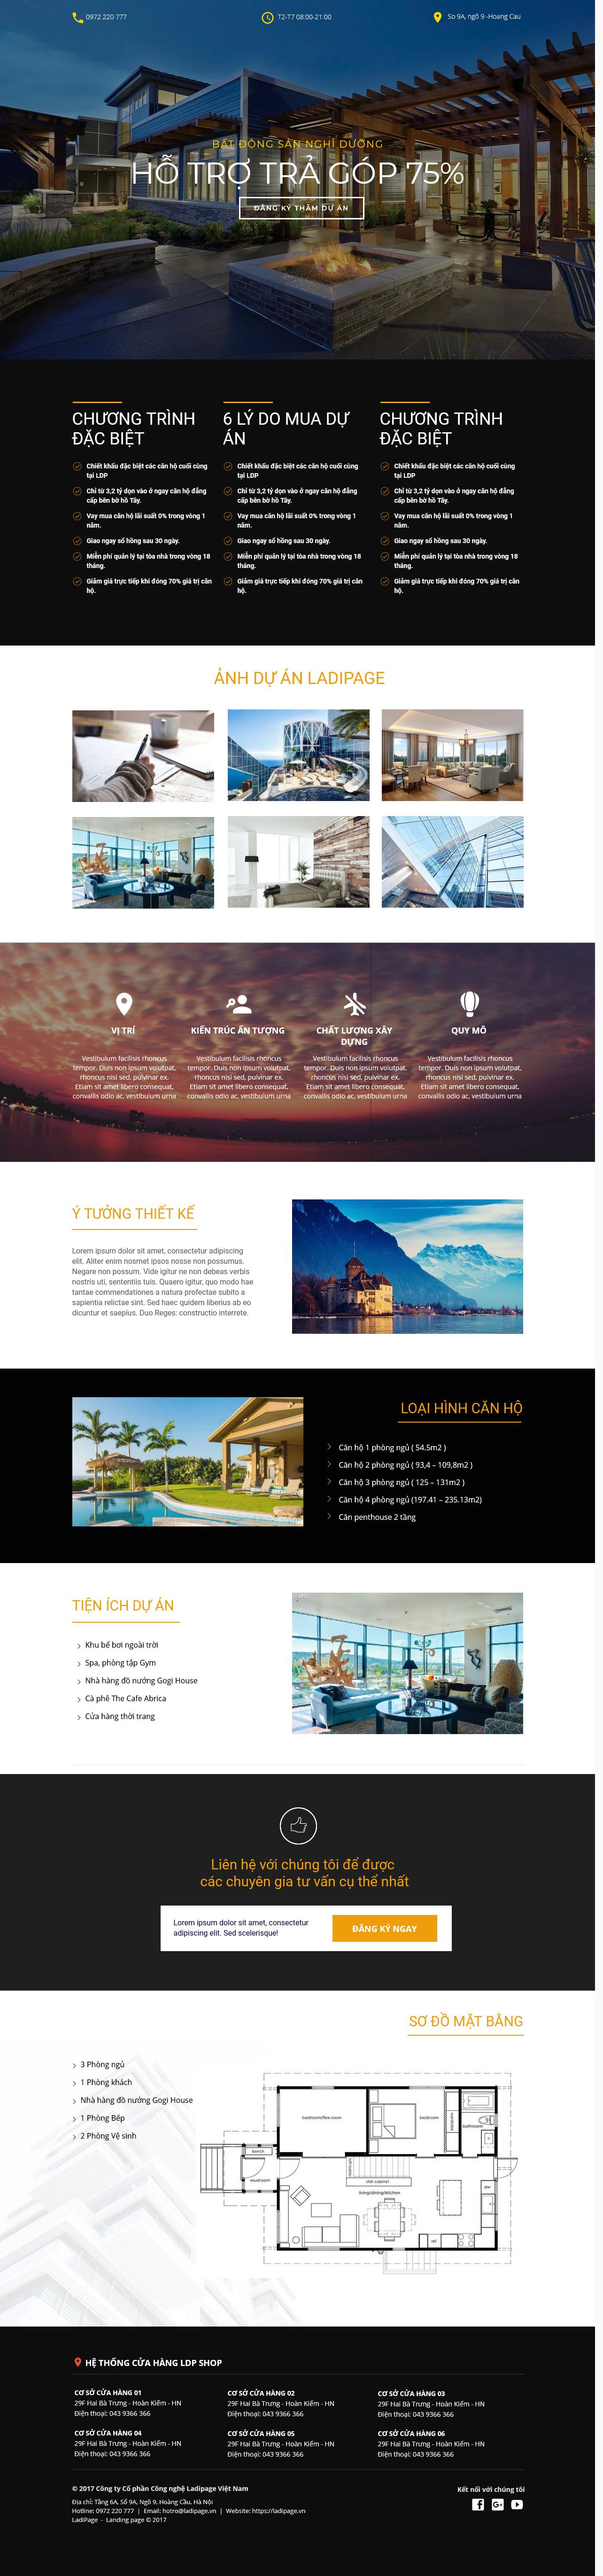 Thiết kế website Thiết kế webiste landingpage bat-dong-san Bất động sản 24